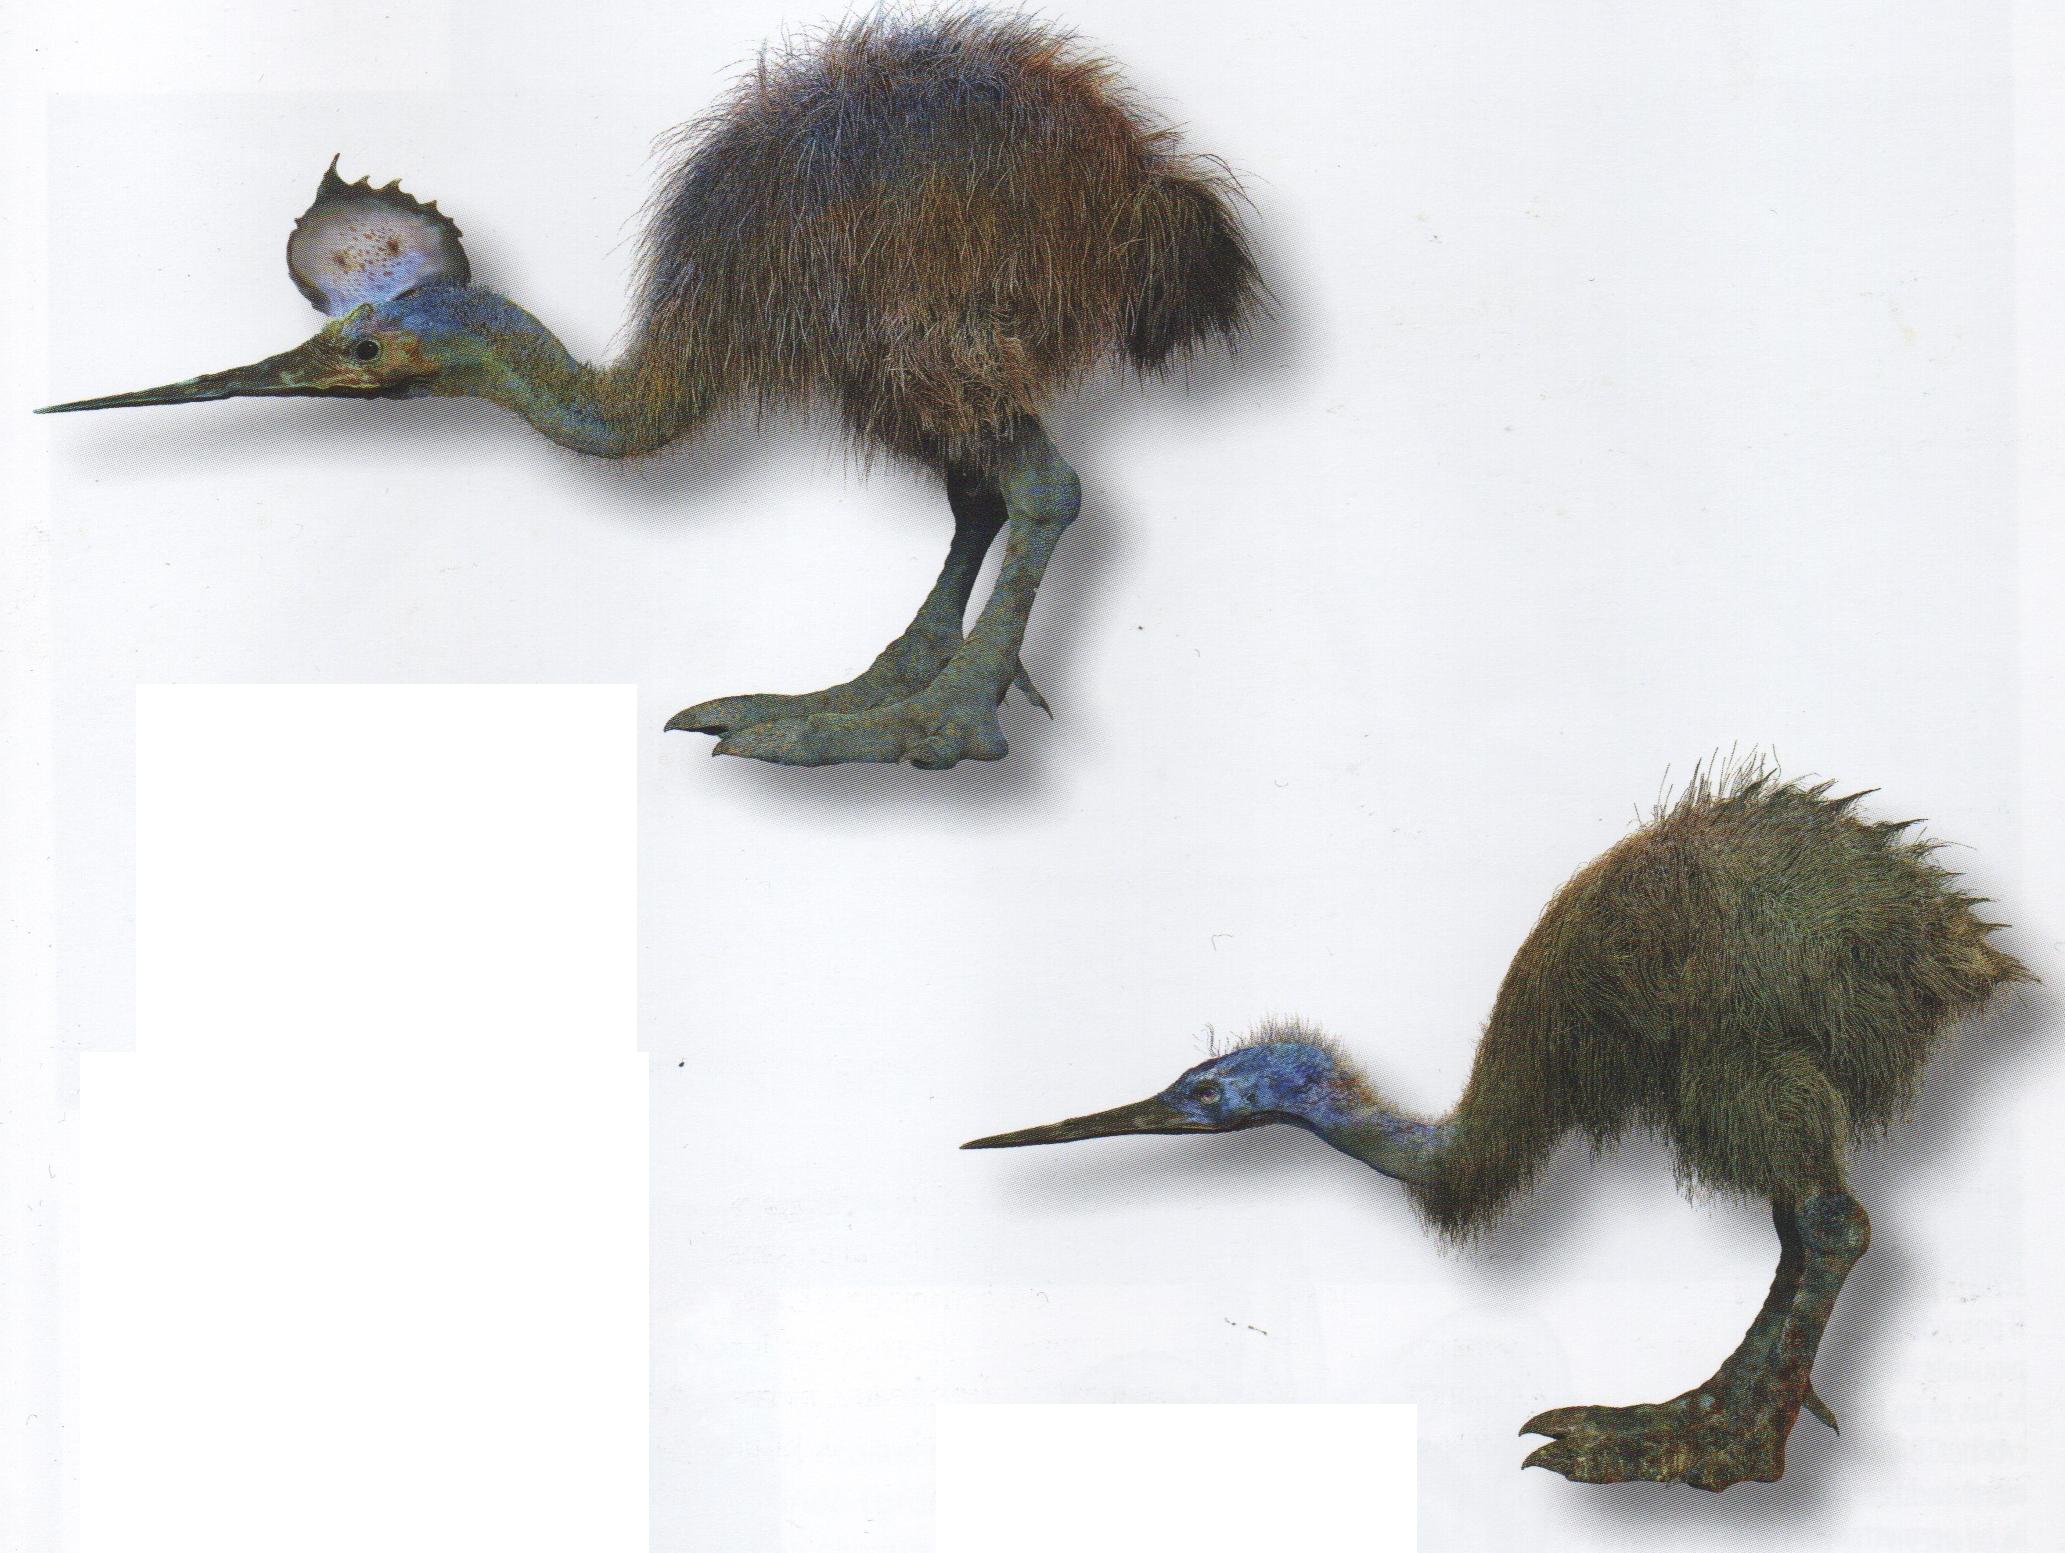 Tringapterus